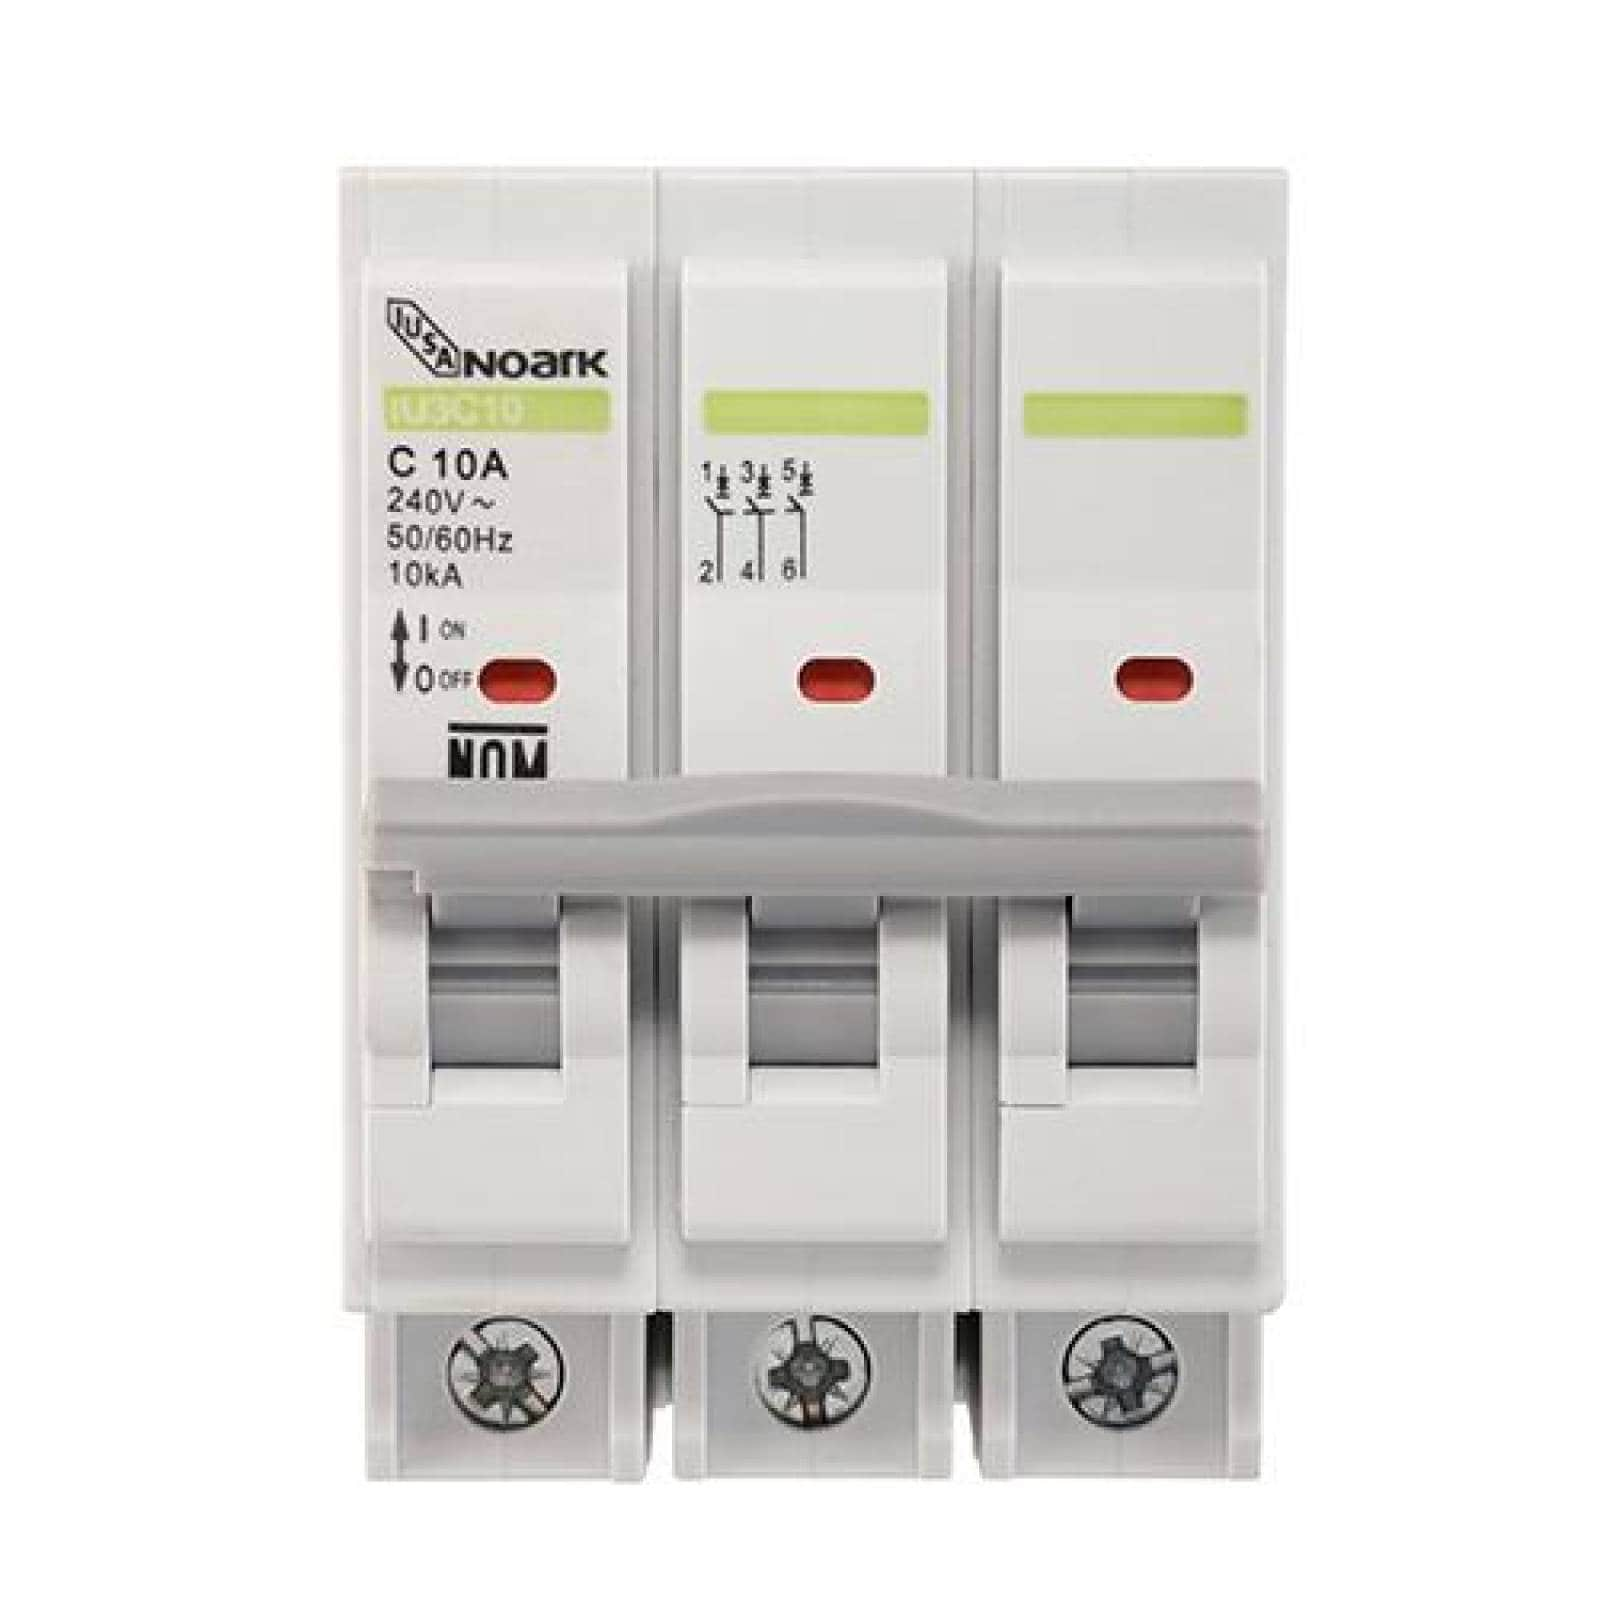 Interruptor termomagnético 3 polos 15 A